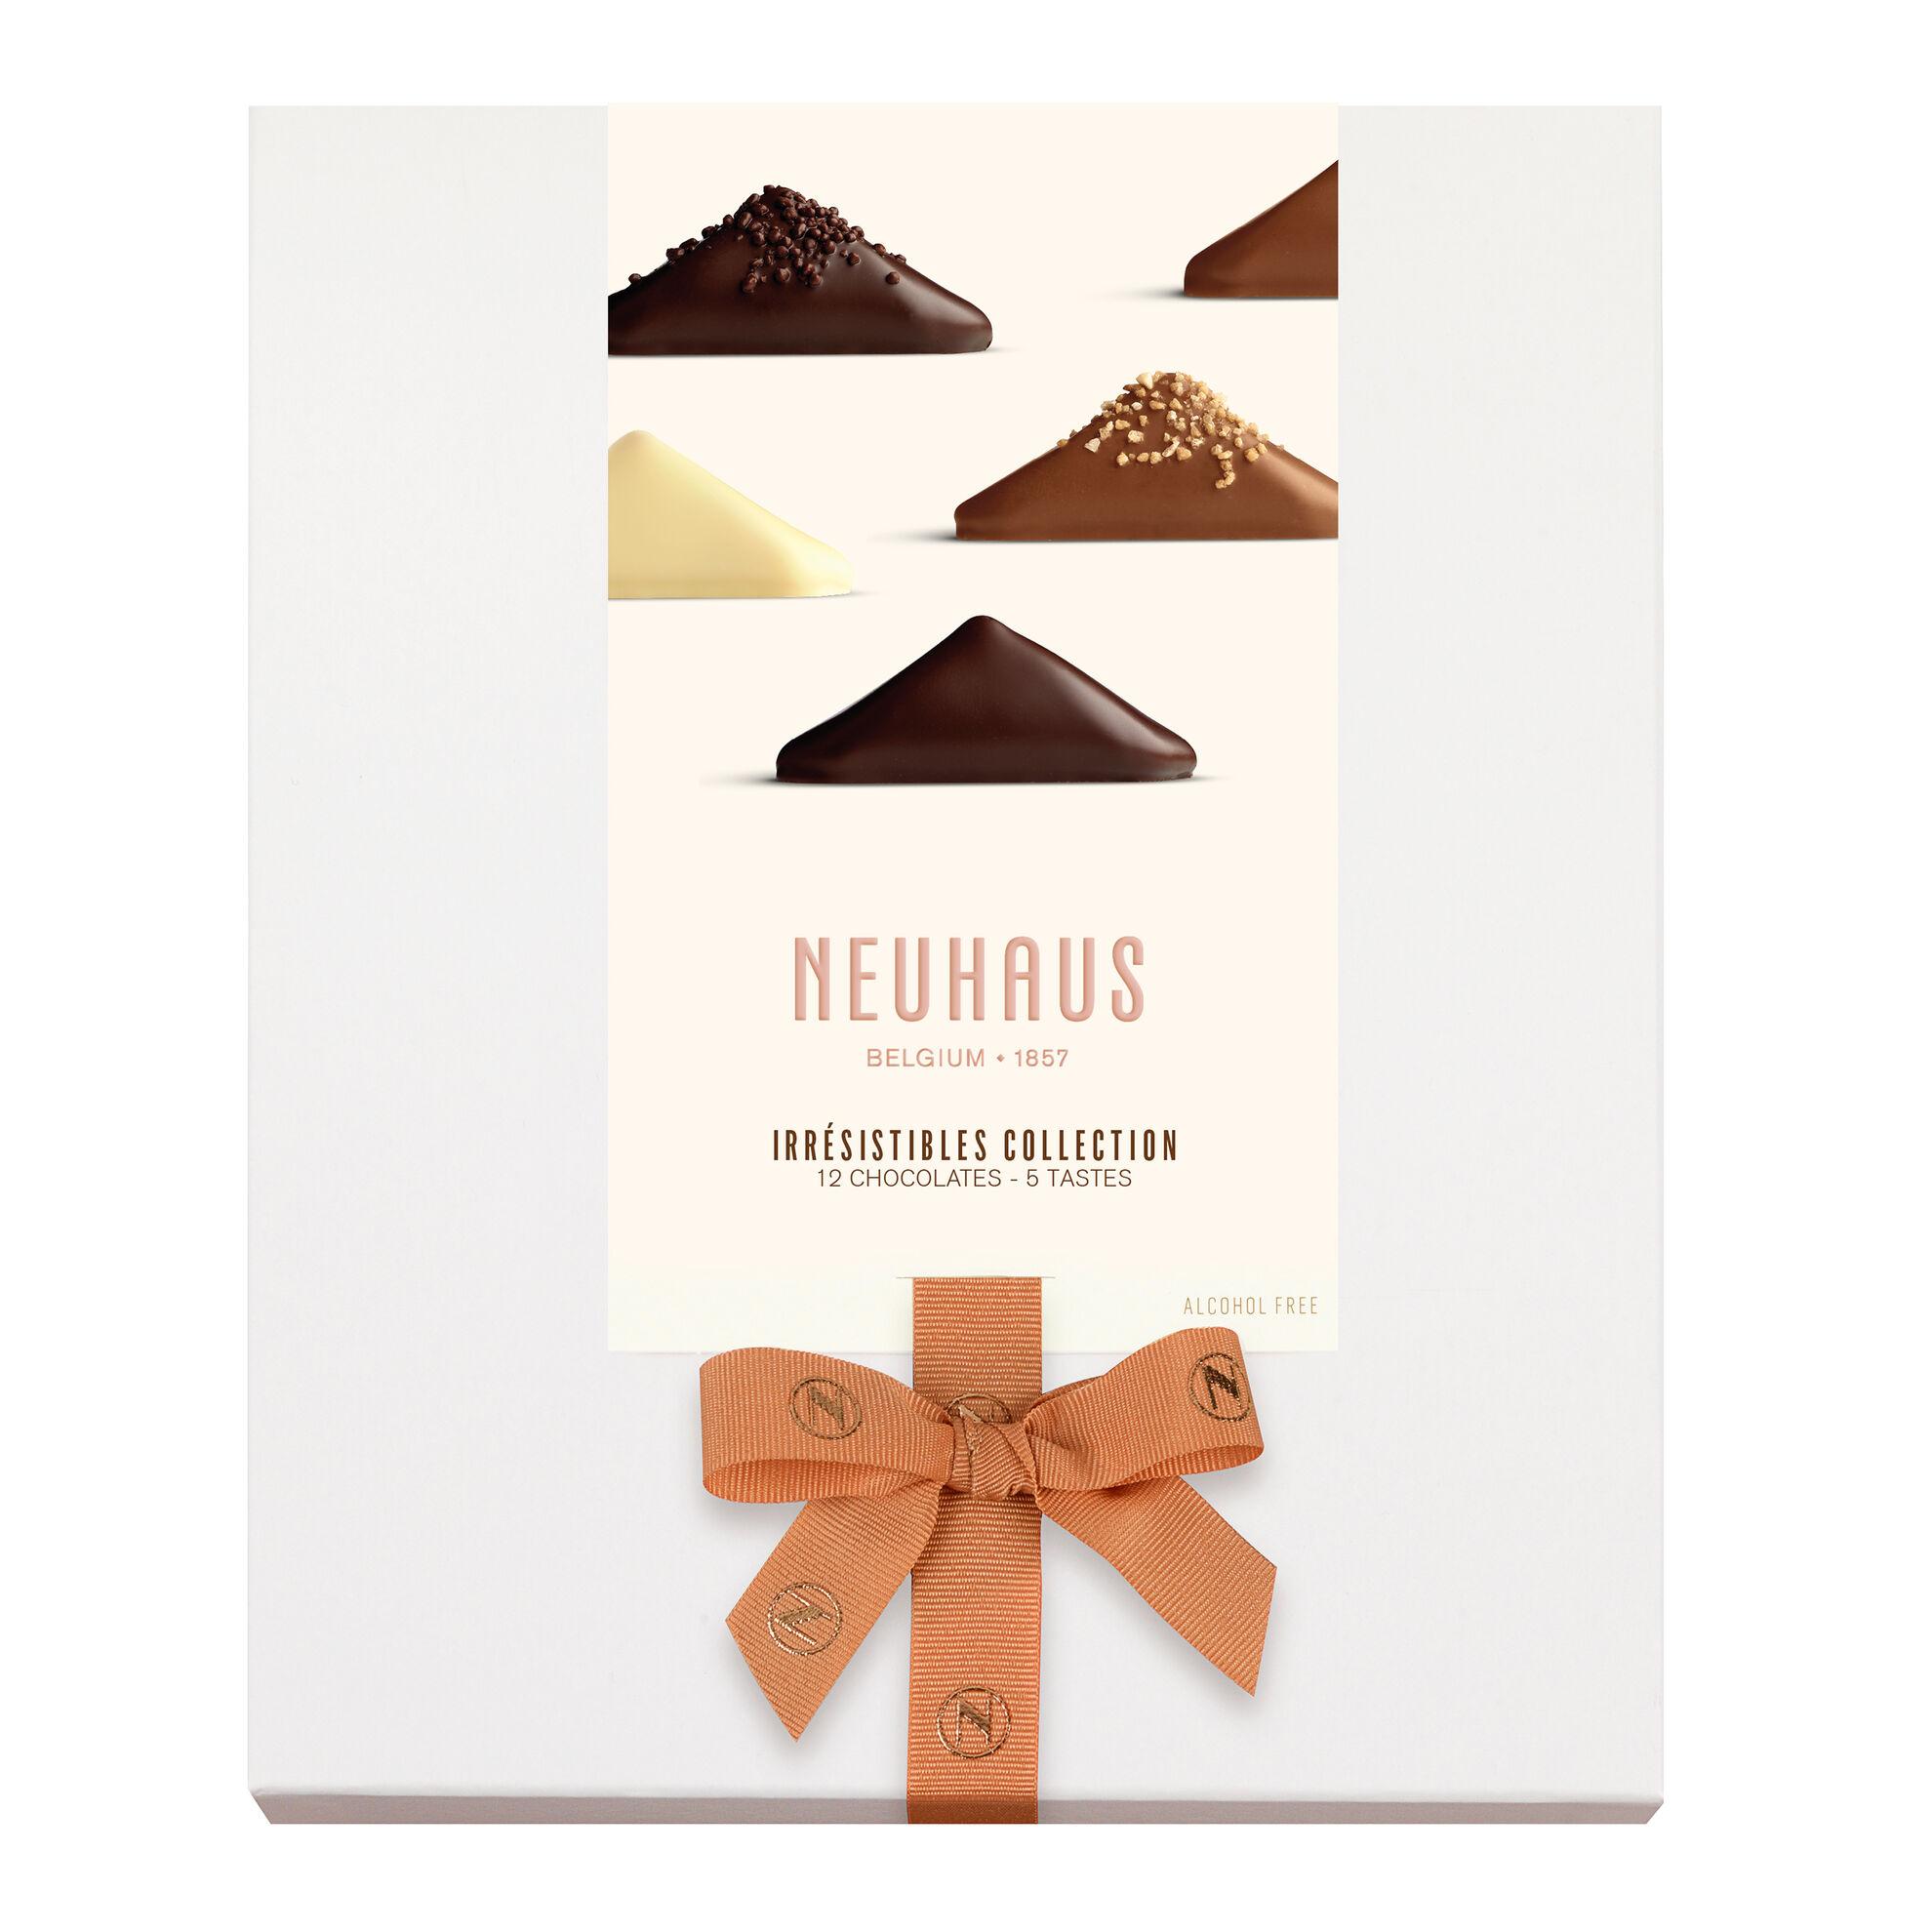 Neuhaus Collection Irrésistibles image number 01